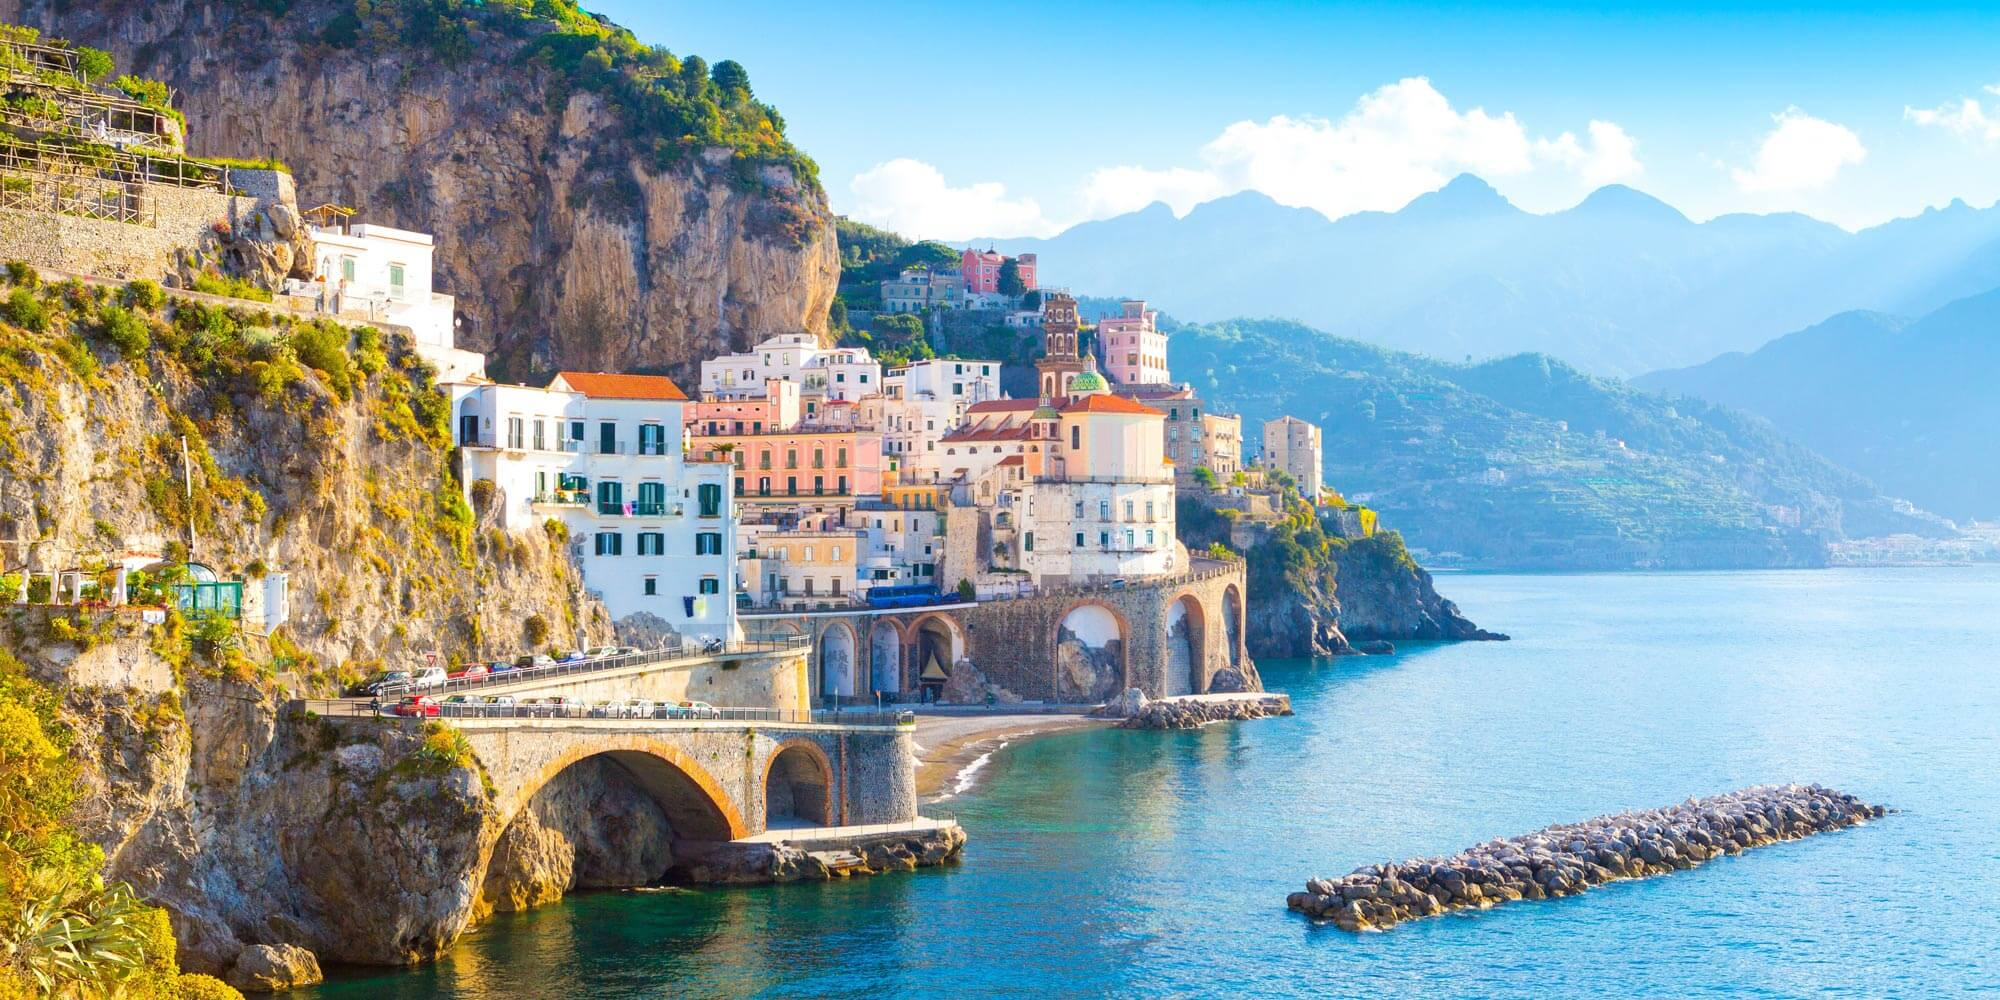 Amalfi tour